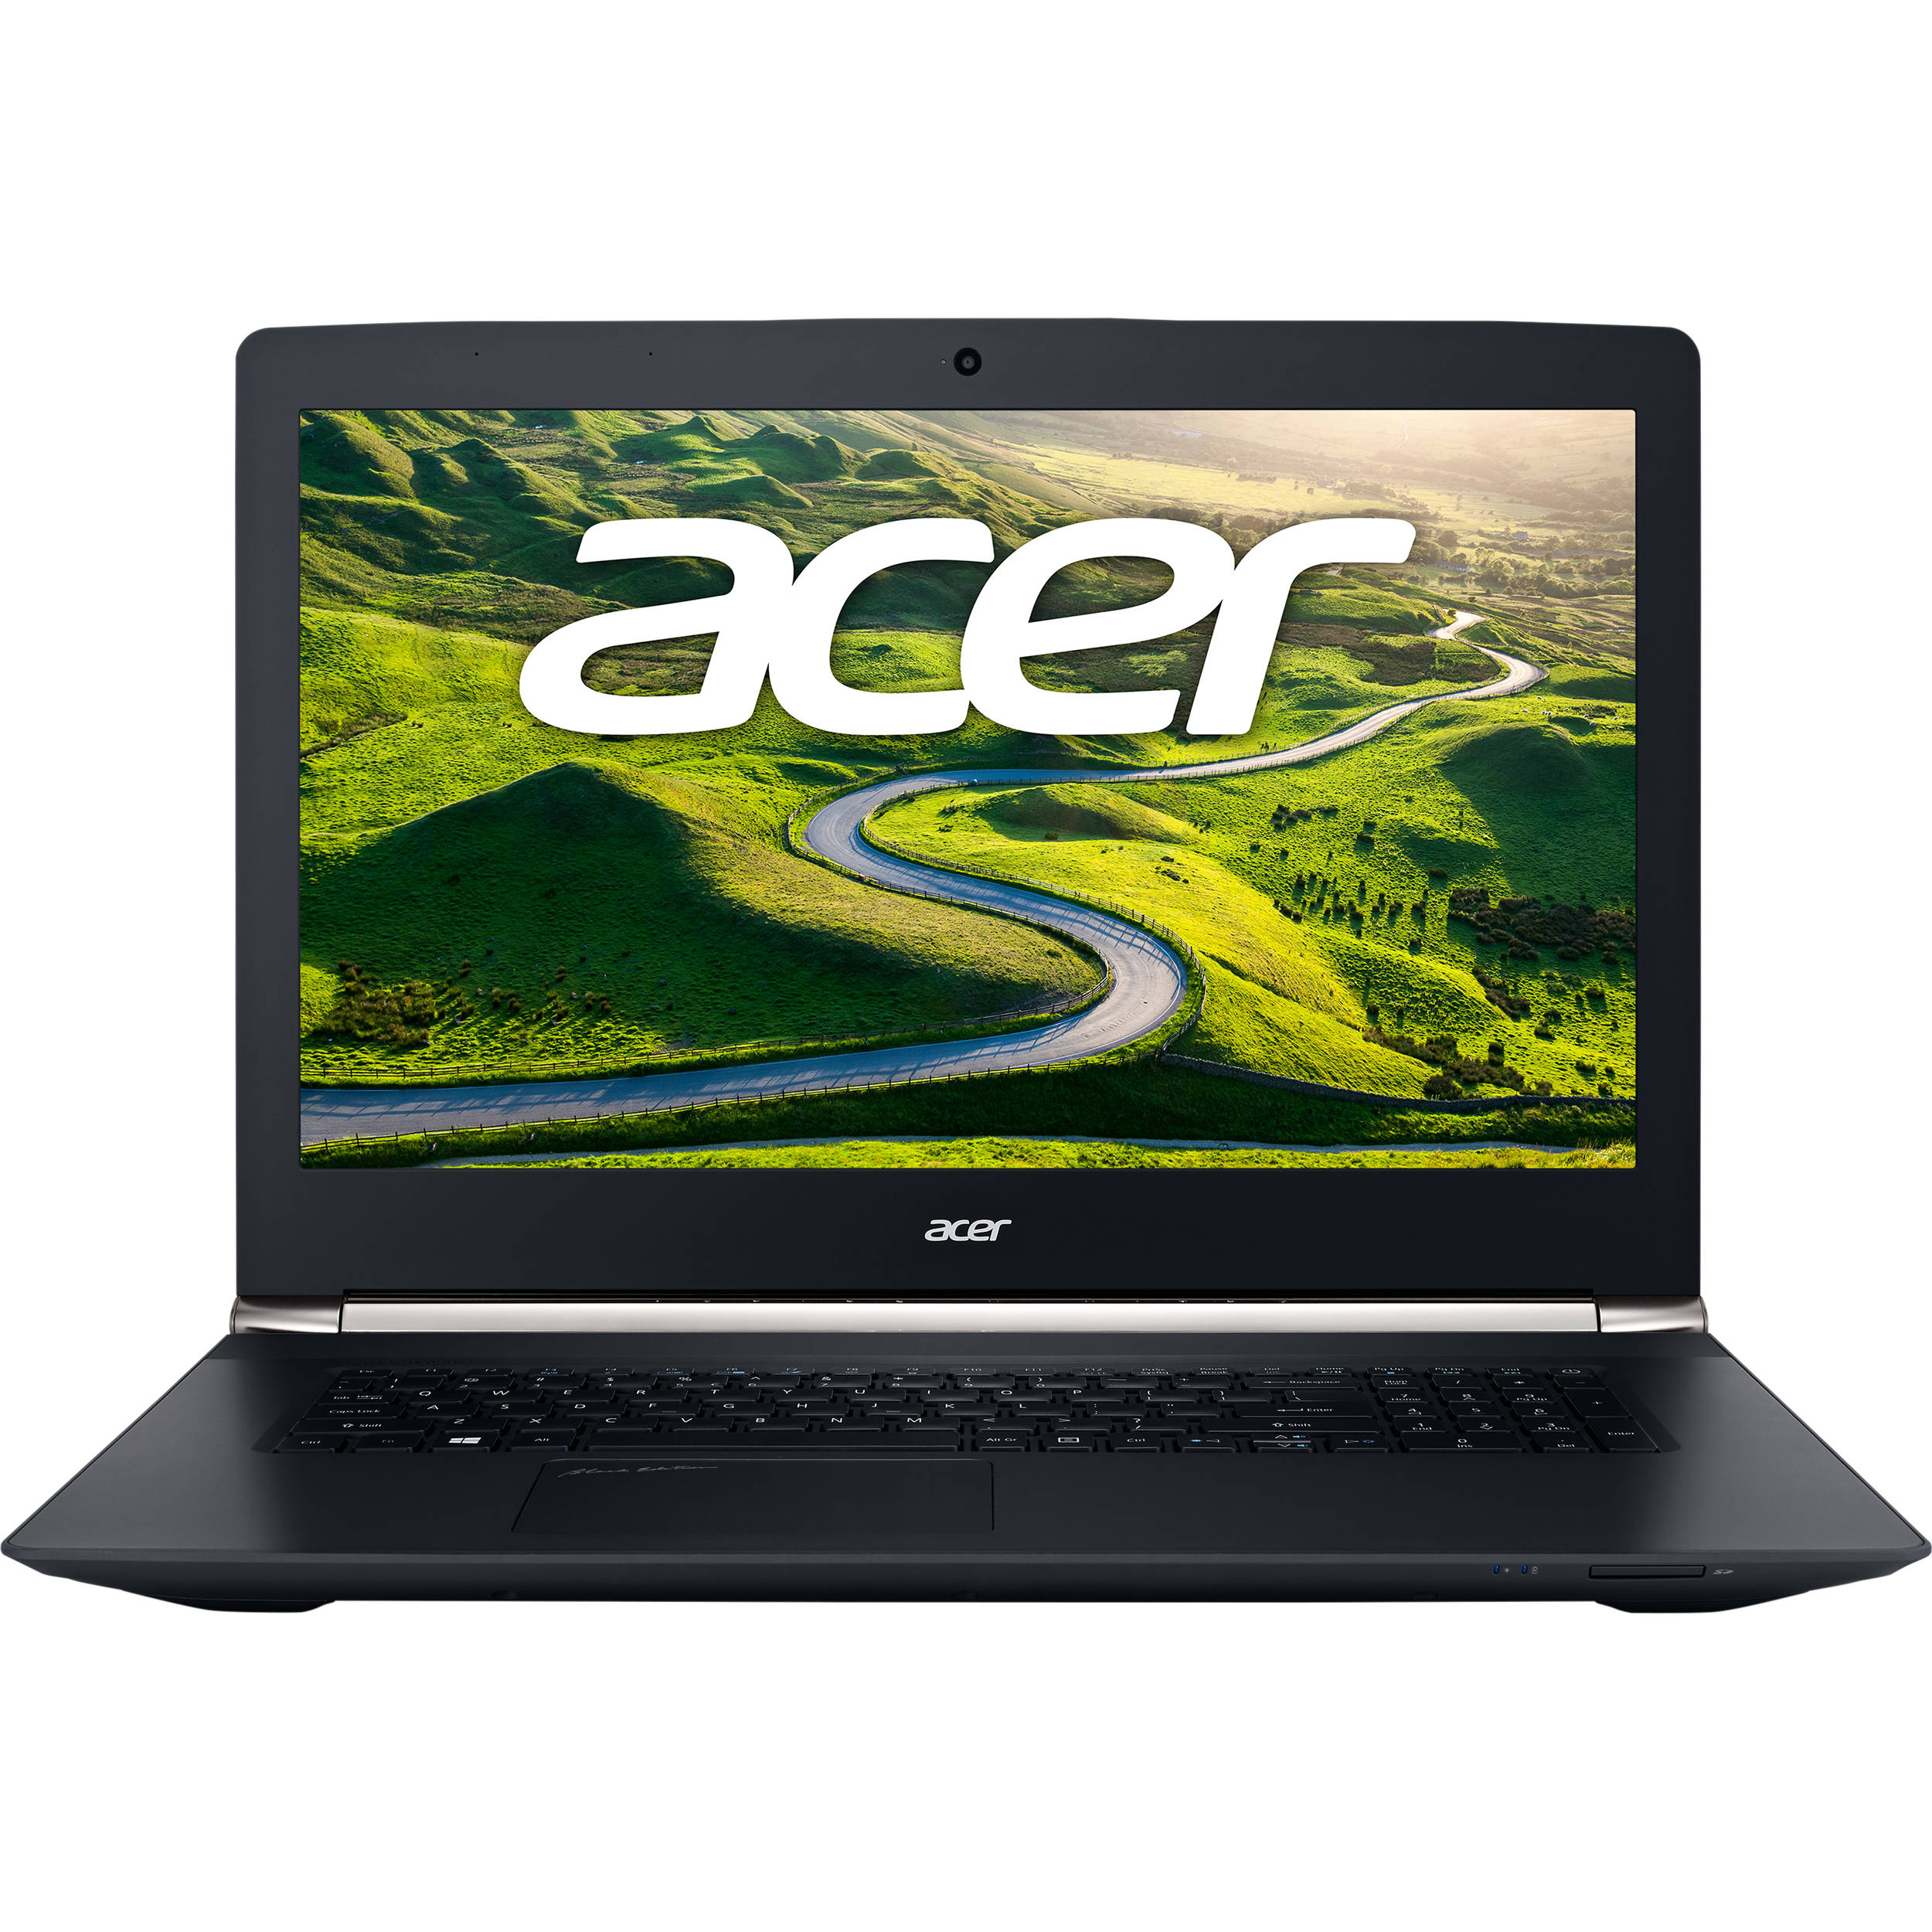 Acer NX.G6TAA.001 17.3 inch Ci76700HQ 16G 256G W10